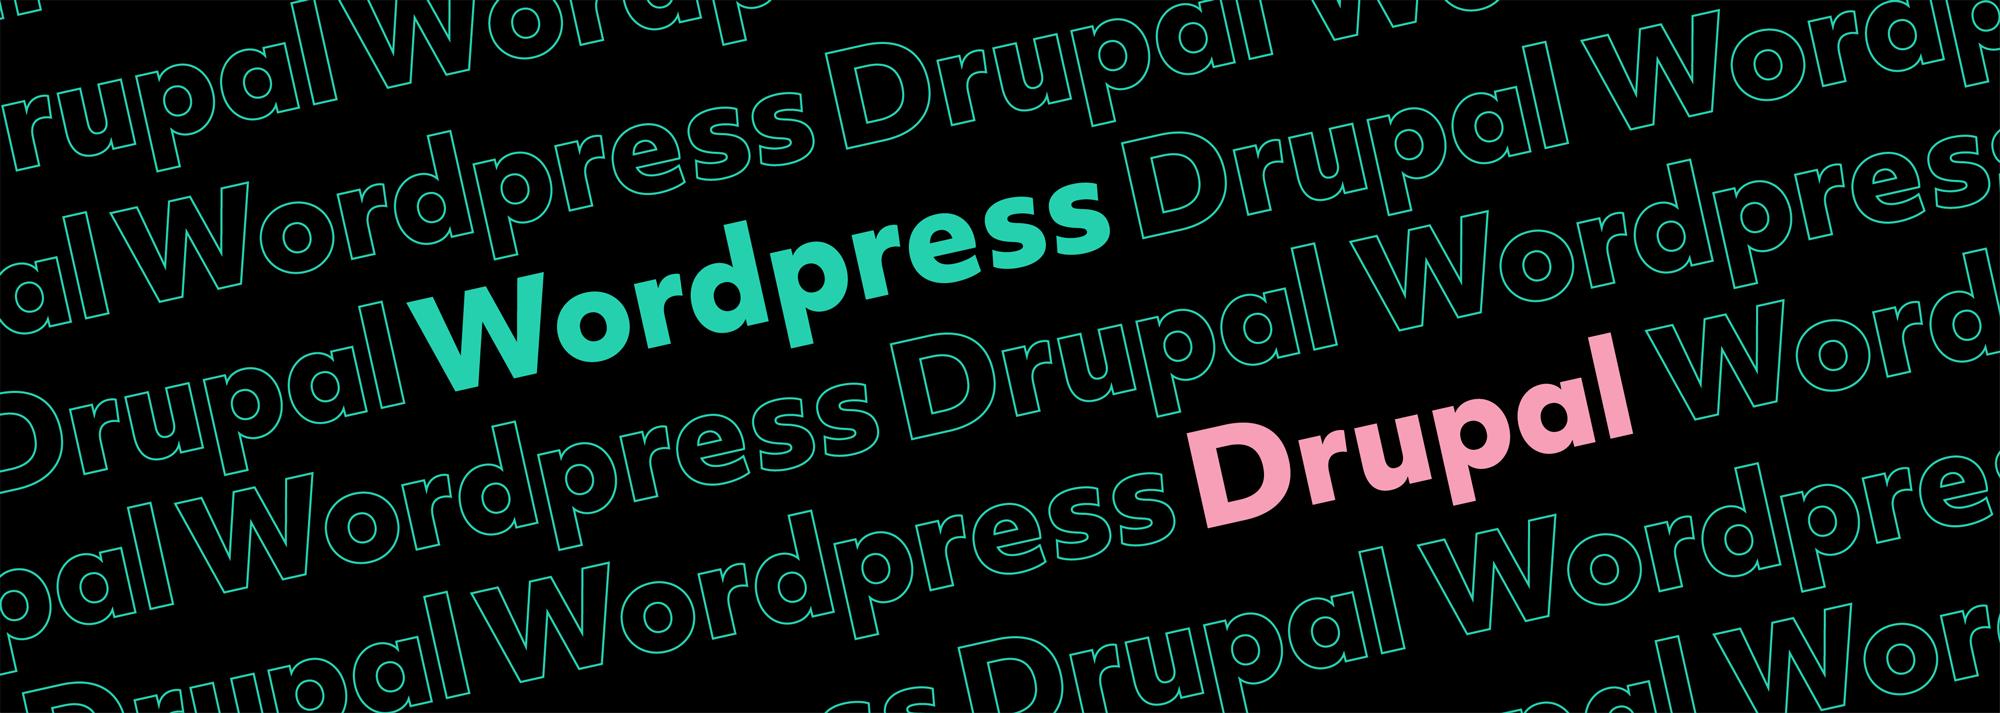 drupal vs wordpress brand development featured